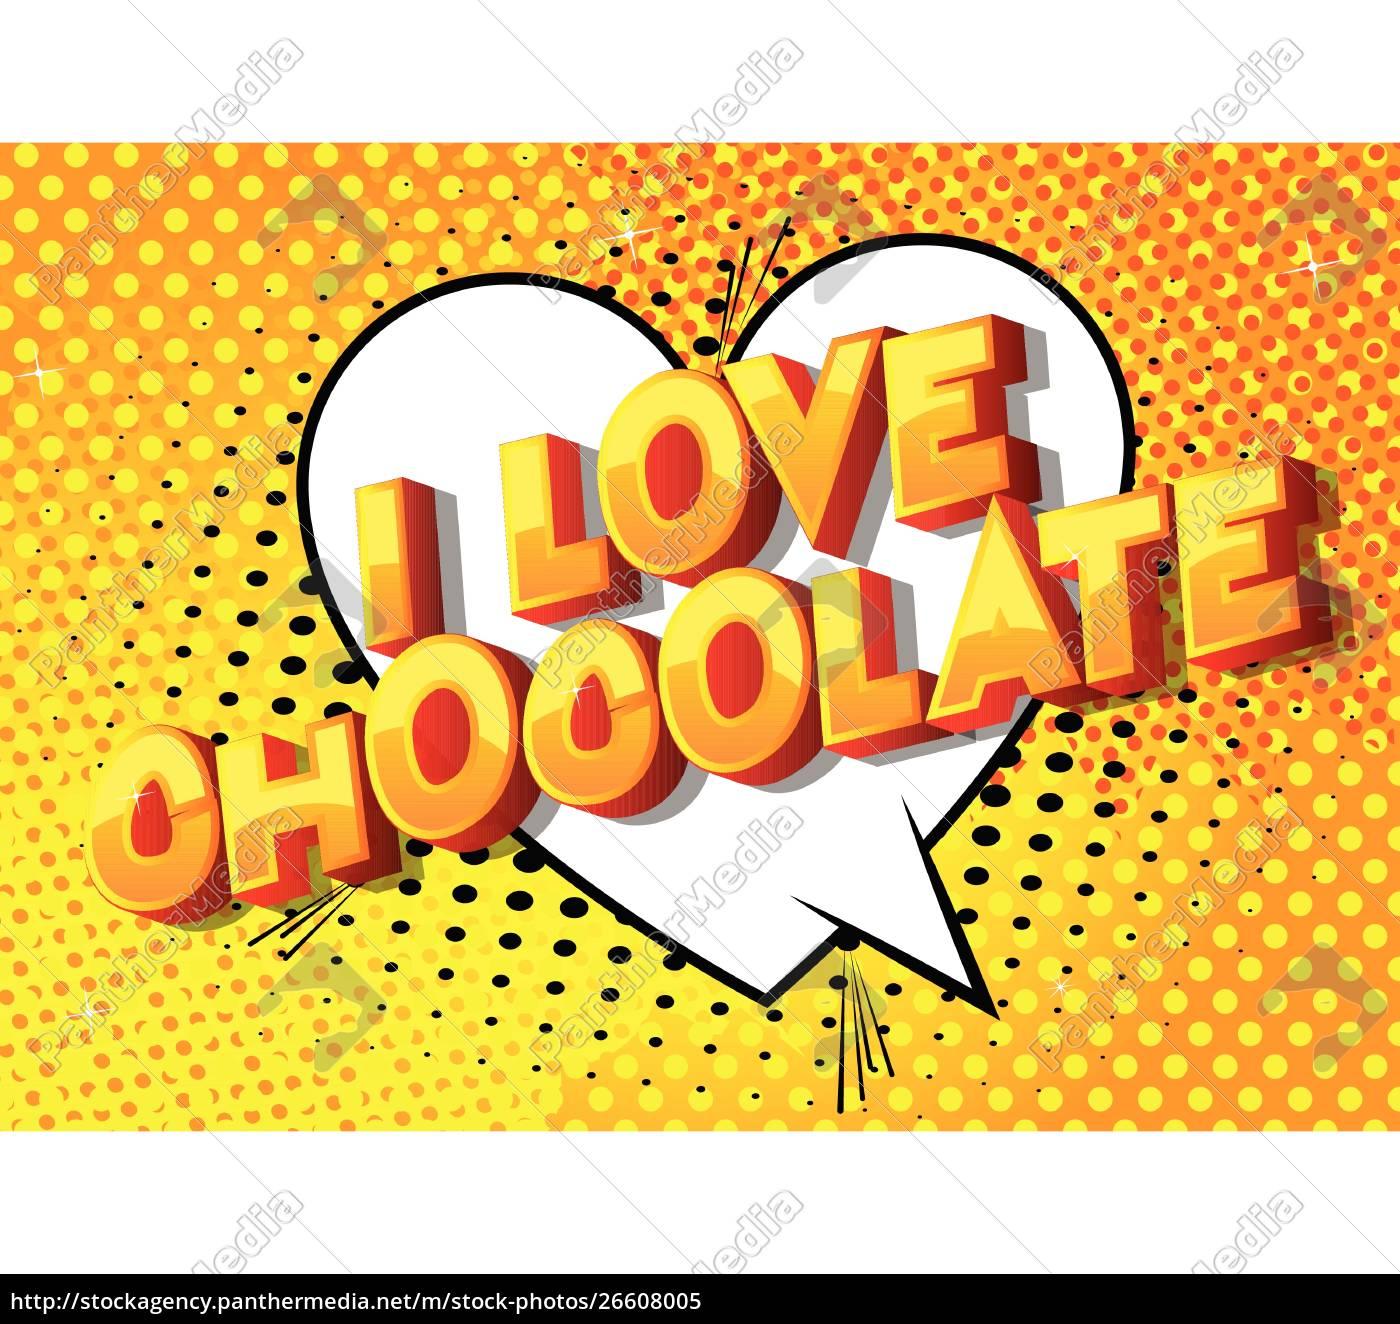 i, love, chocolate, -, comic, book - 26608005